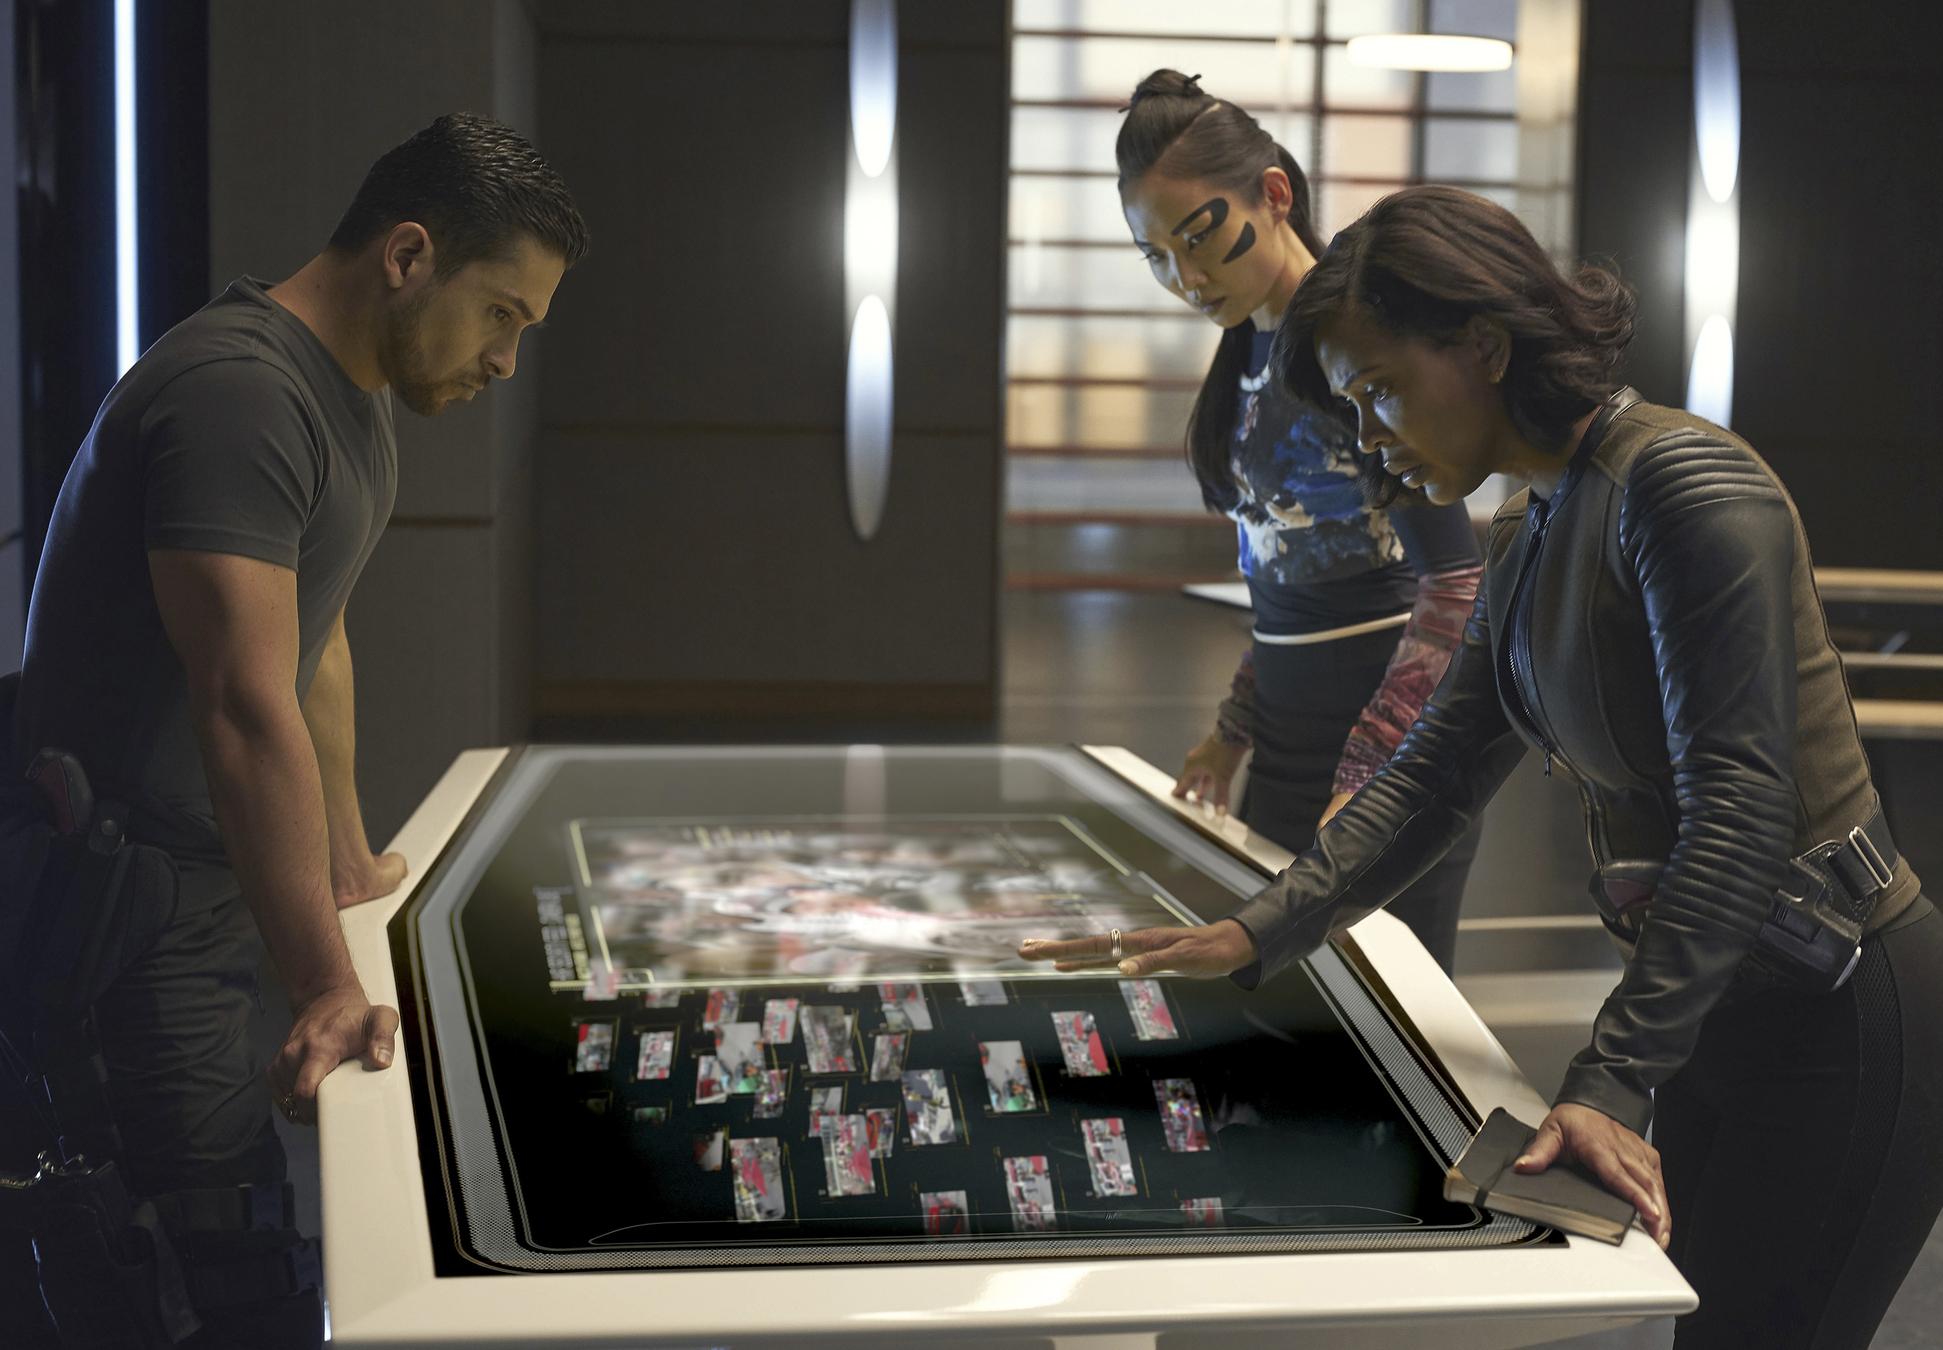 TRAILER: Wilmer Valderrama Stars in Trippy Sci-Fi 'Minority Report' TV Reboot